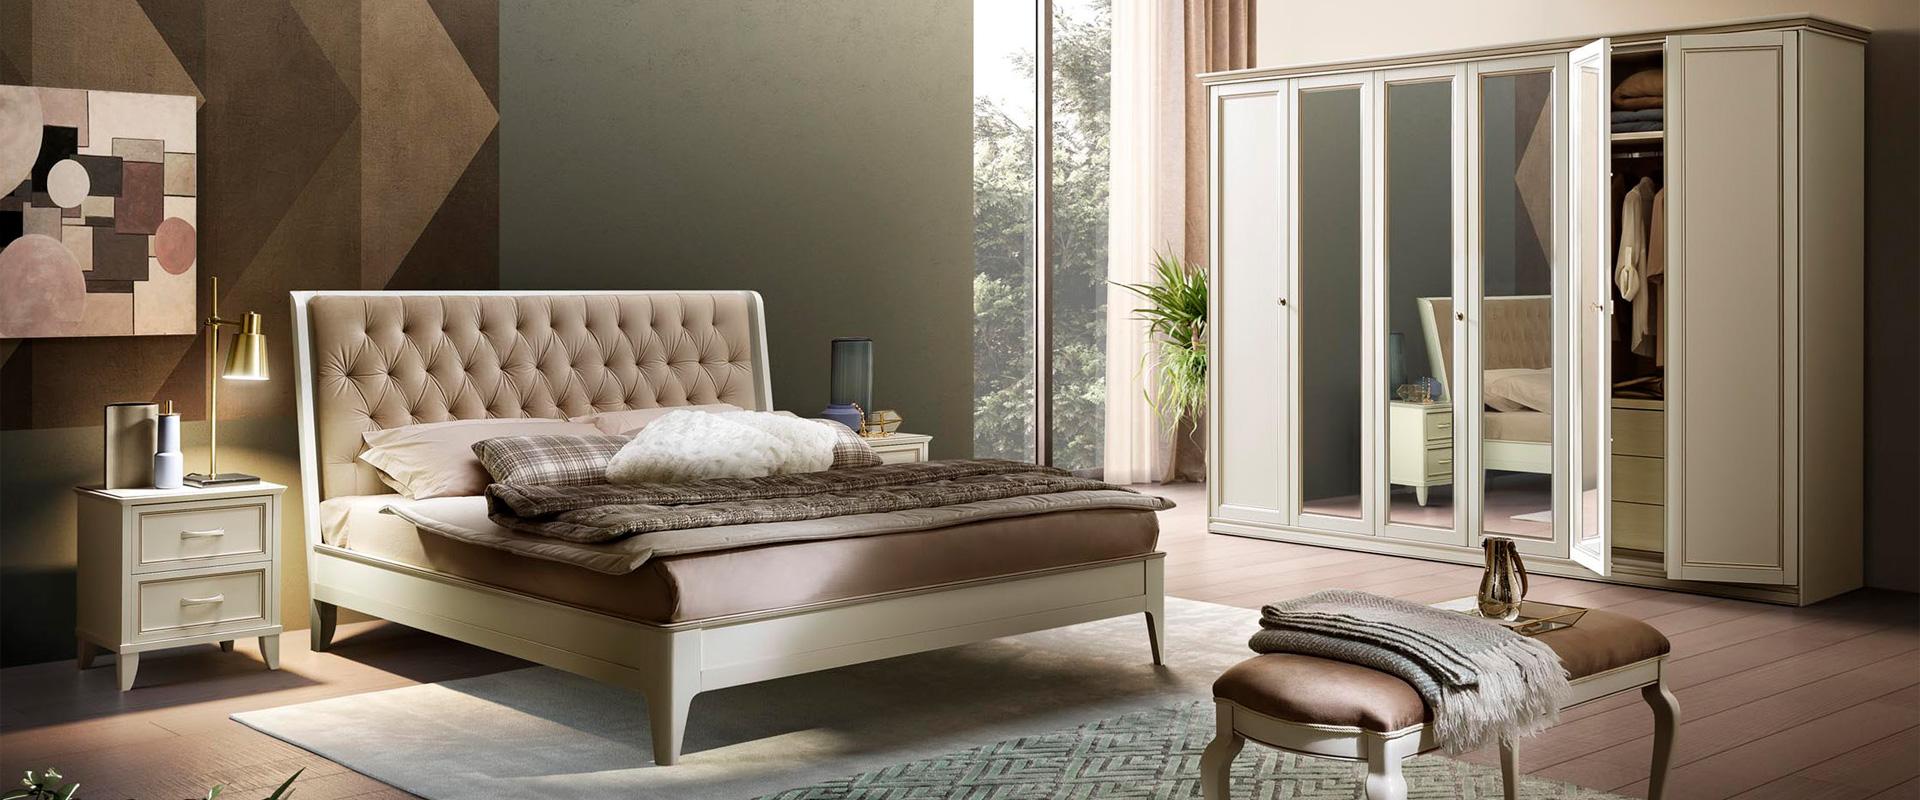 Спальня GIOTTO bianco